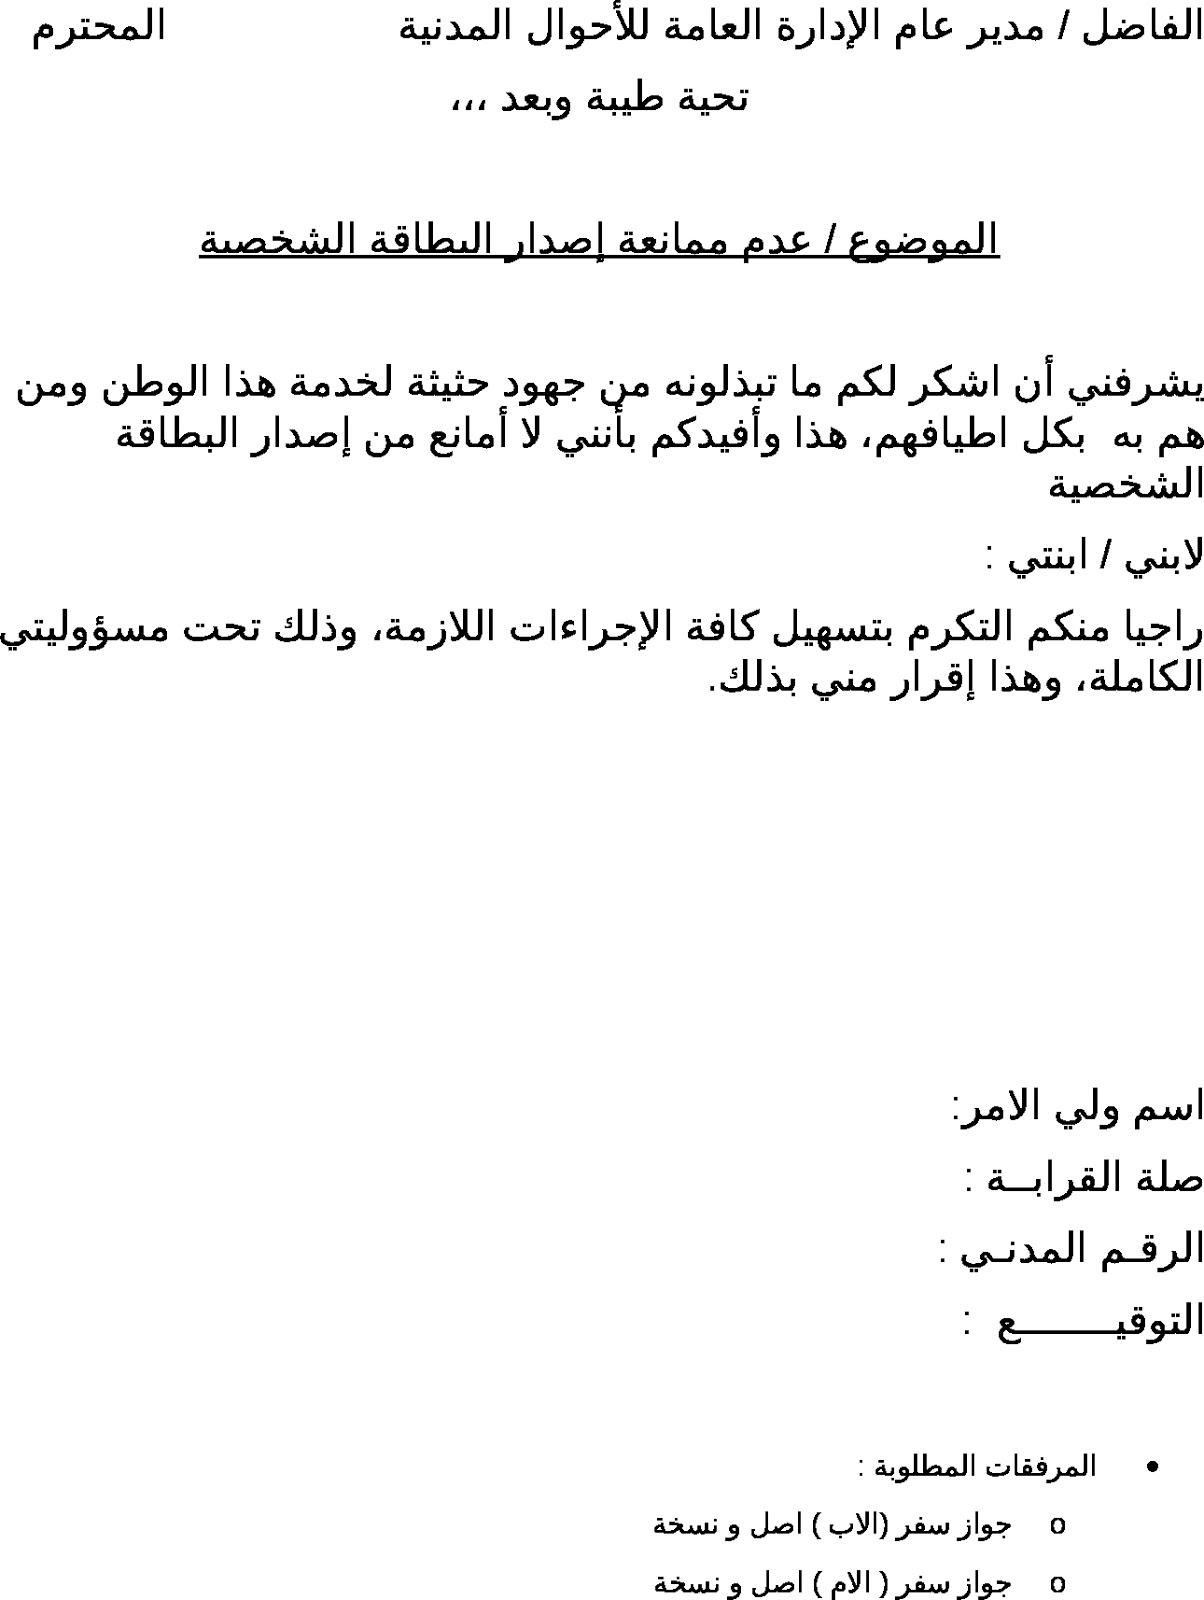 Birla World School Oman: Resident card procedure and form